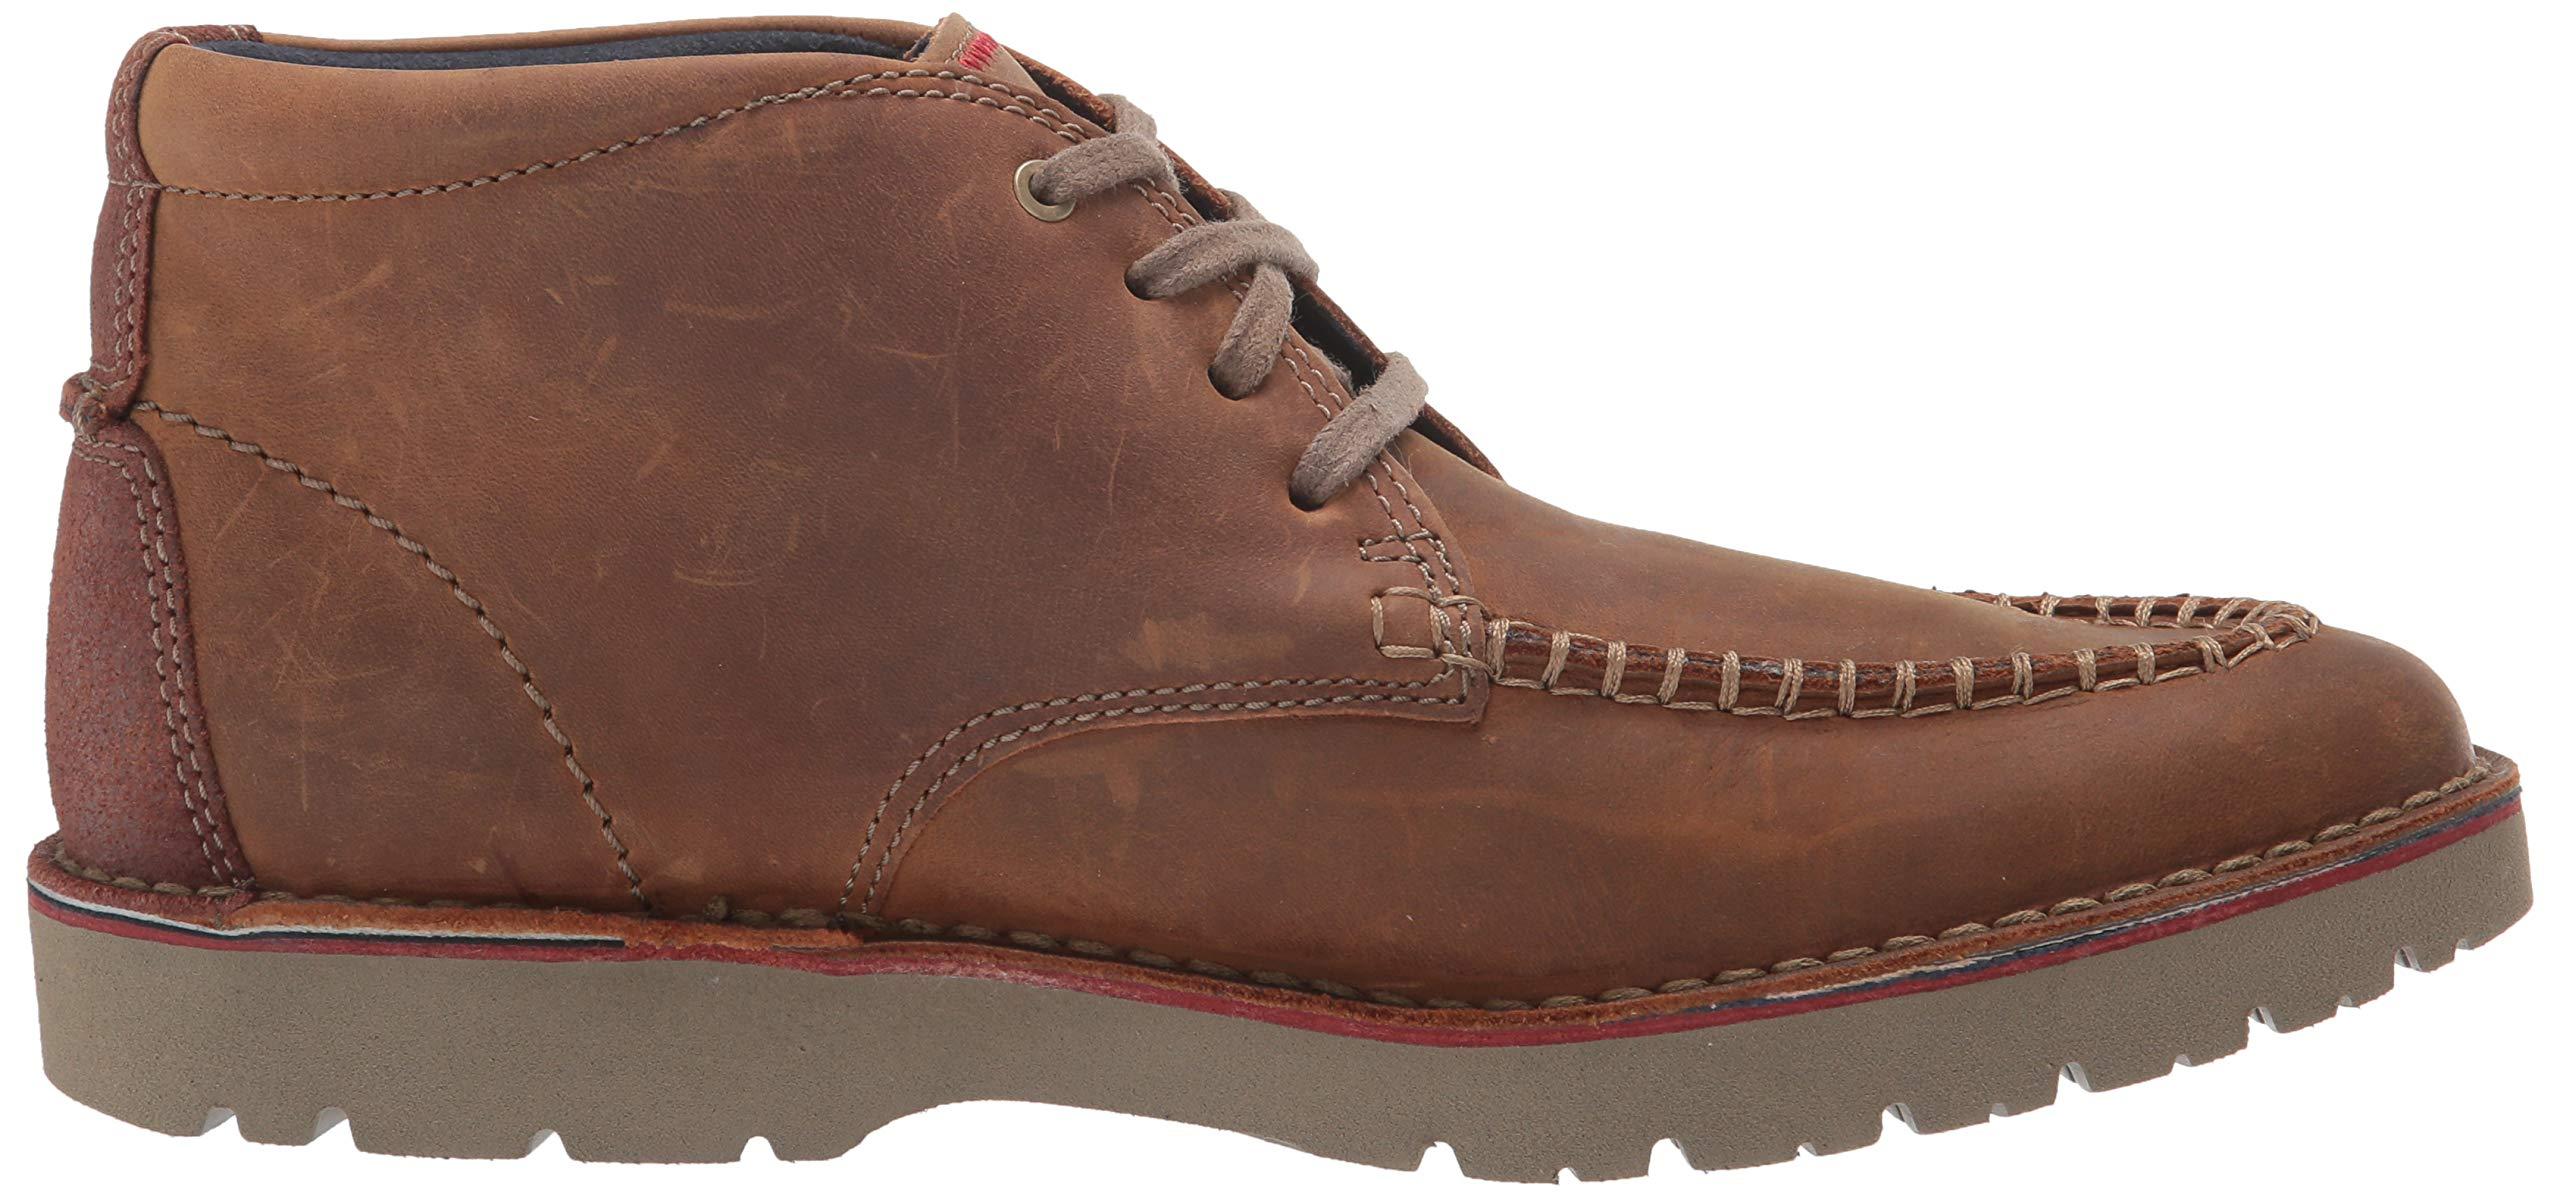 Clarks Men's Vargo Apron Ankle Boot 7